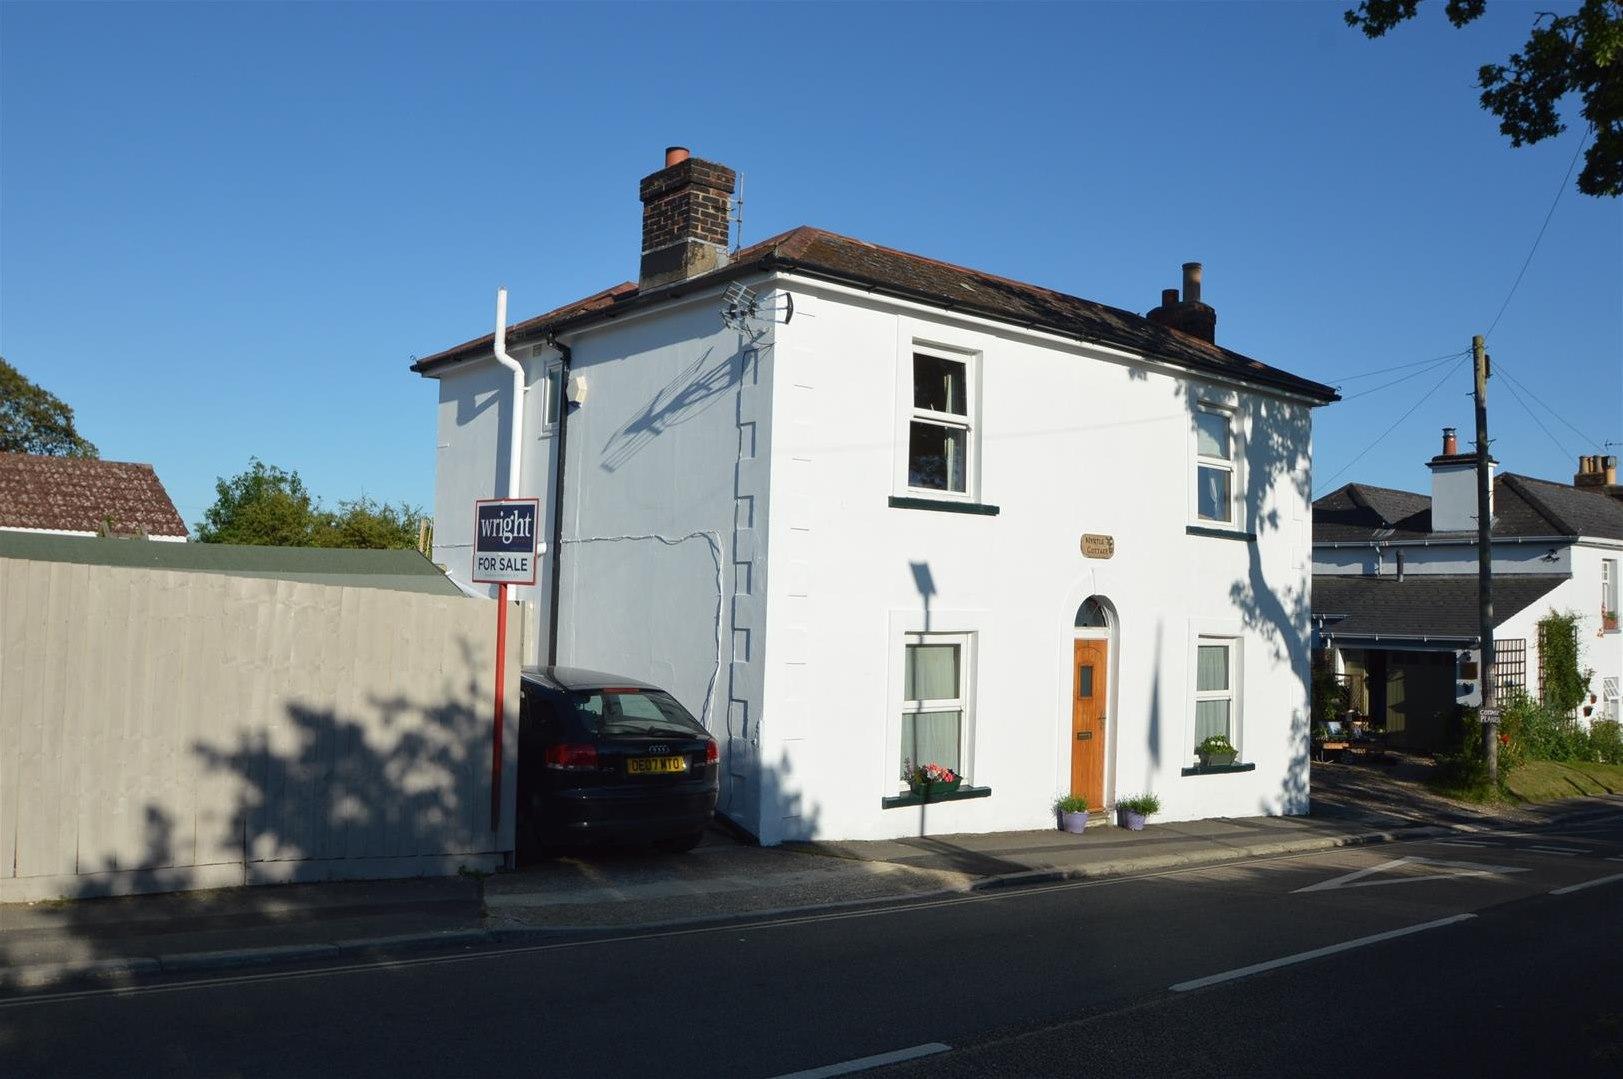 Ashey Road